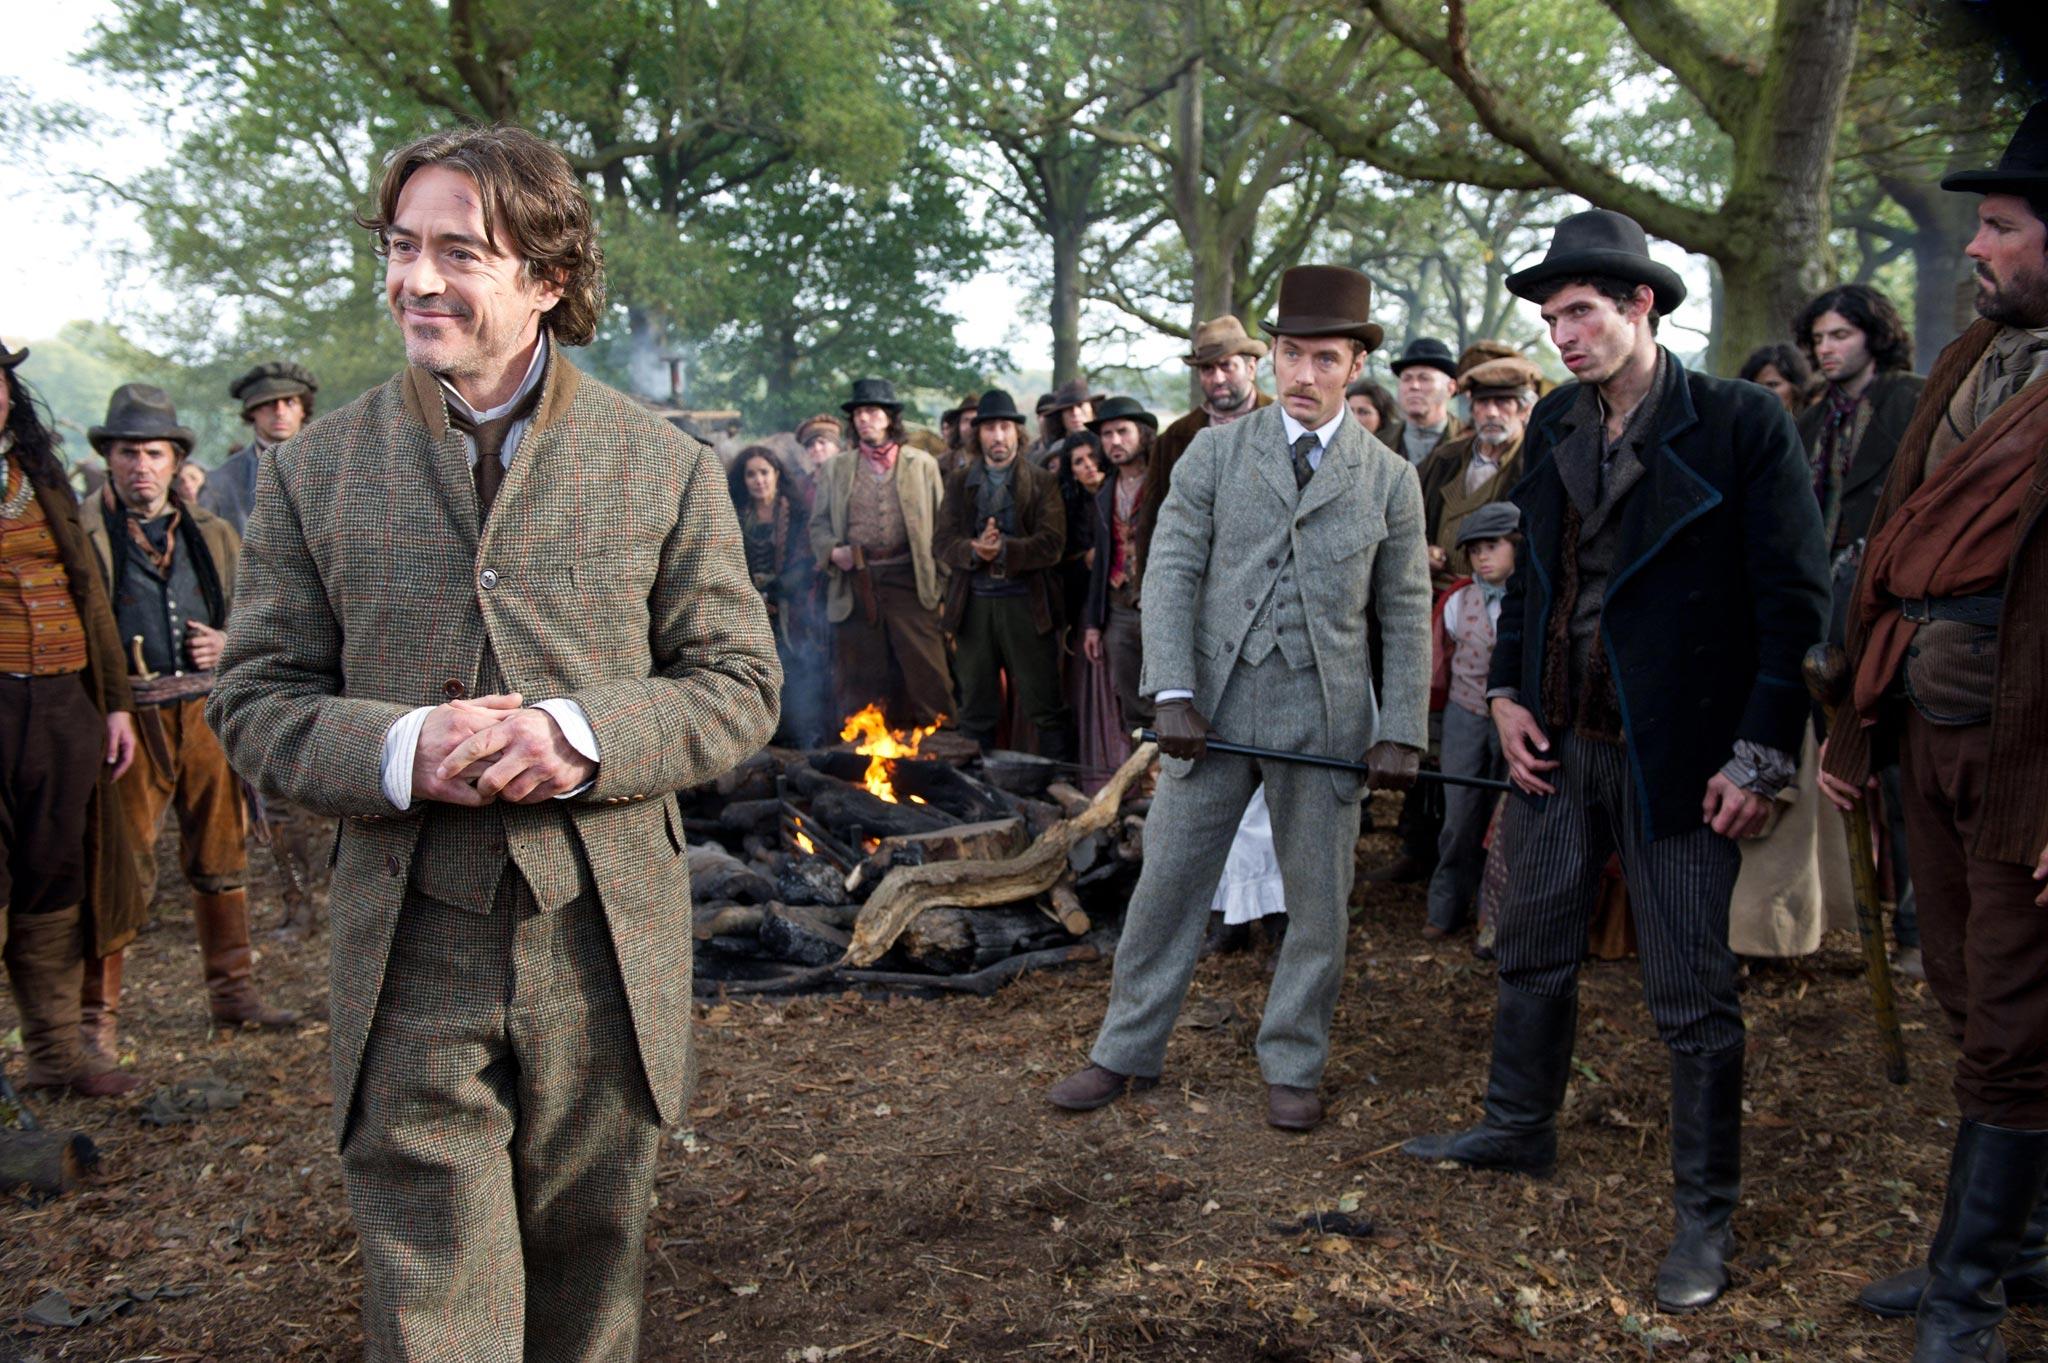 «Смотреть Онлайн Шерлок Холмс 2 Роберт Дауни Младший» — 2009